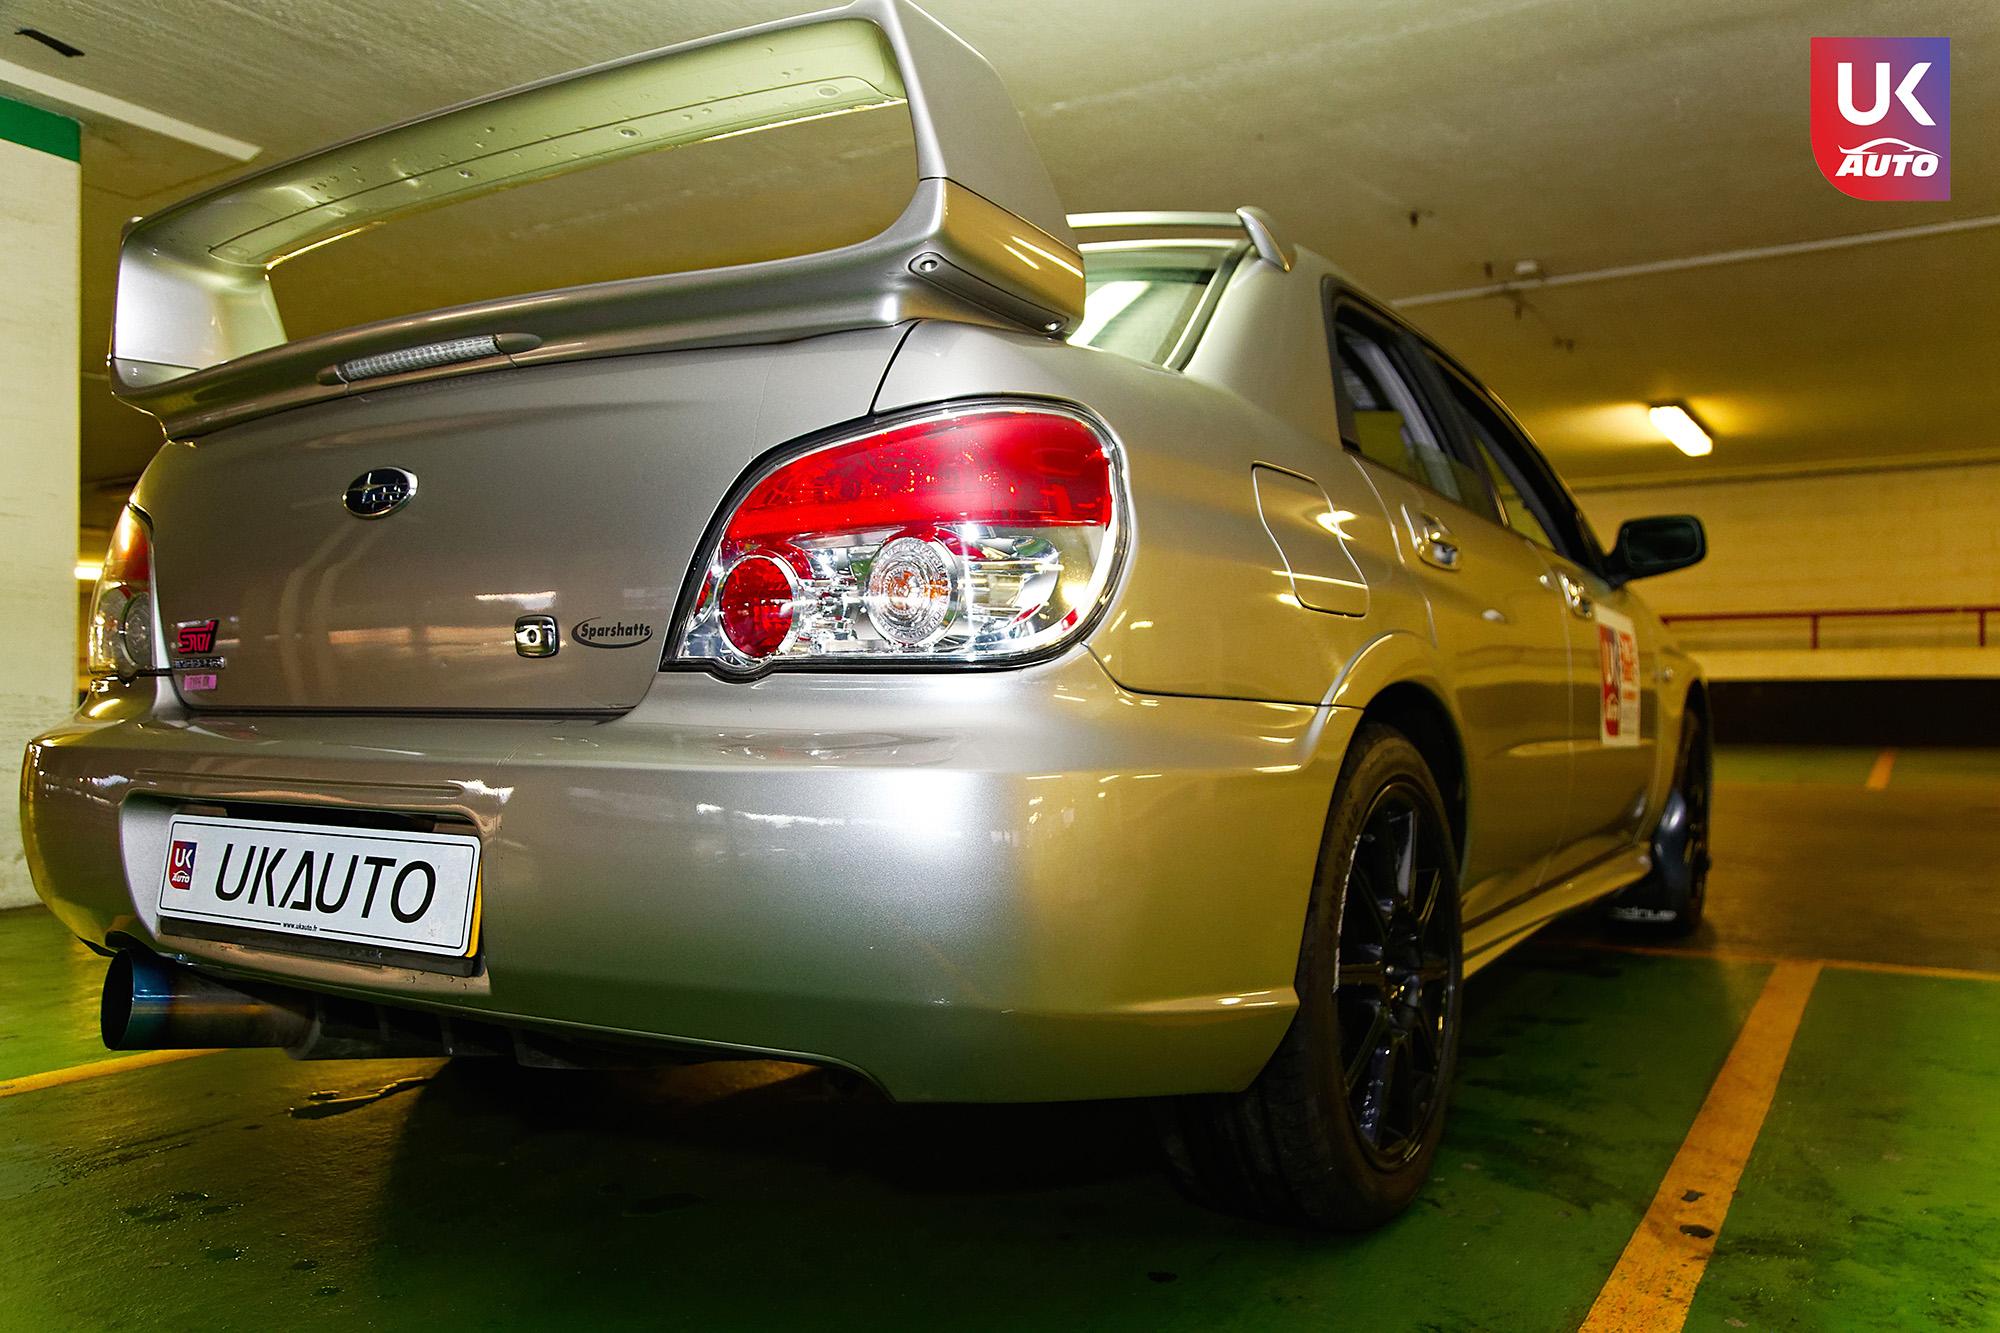 import subaru impreza wrx sti rhd import voiture angleterre auto import2 - Felecitation a Christophe pour cette Subaru Impreza Wrx Sti RHD Supercharged Importation voiture angleterre